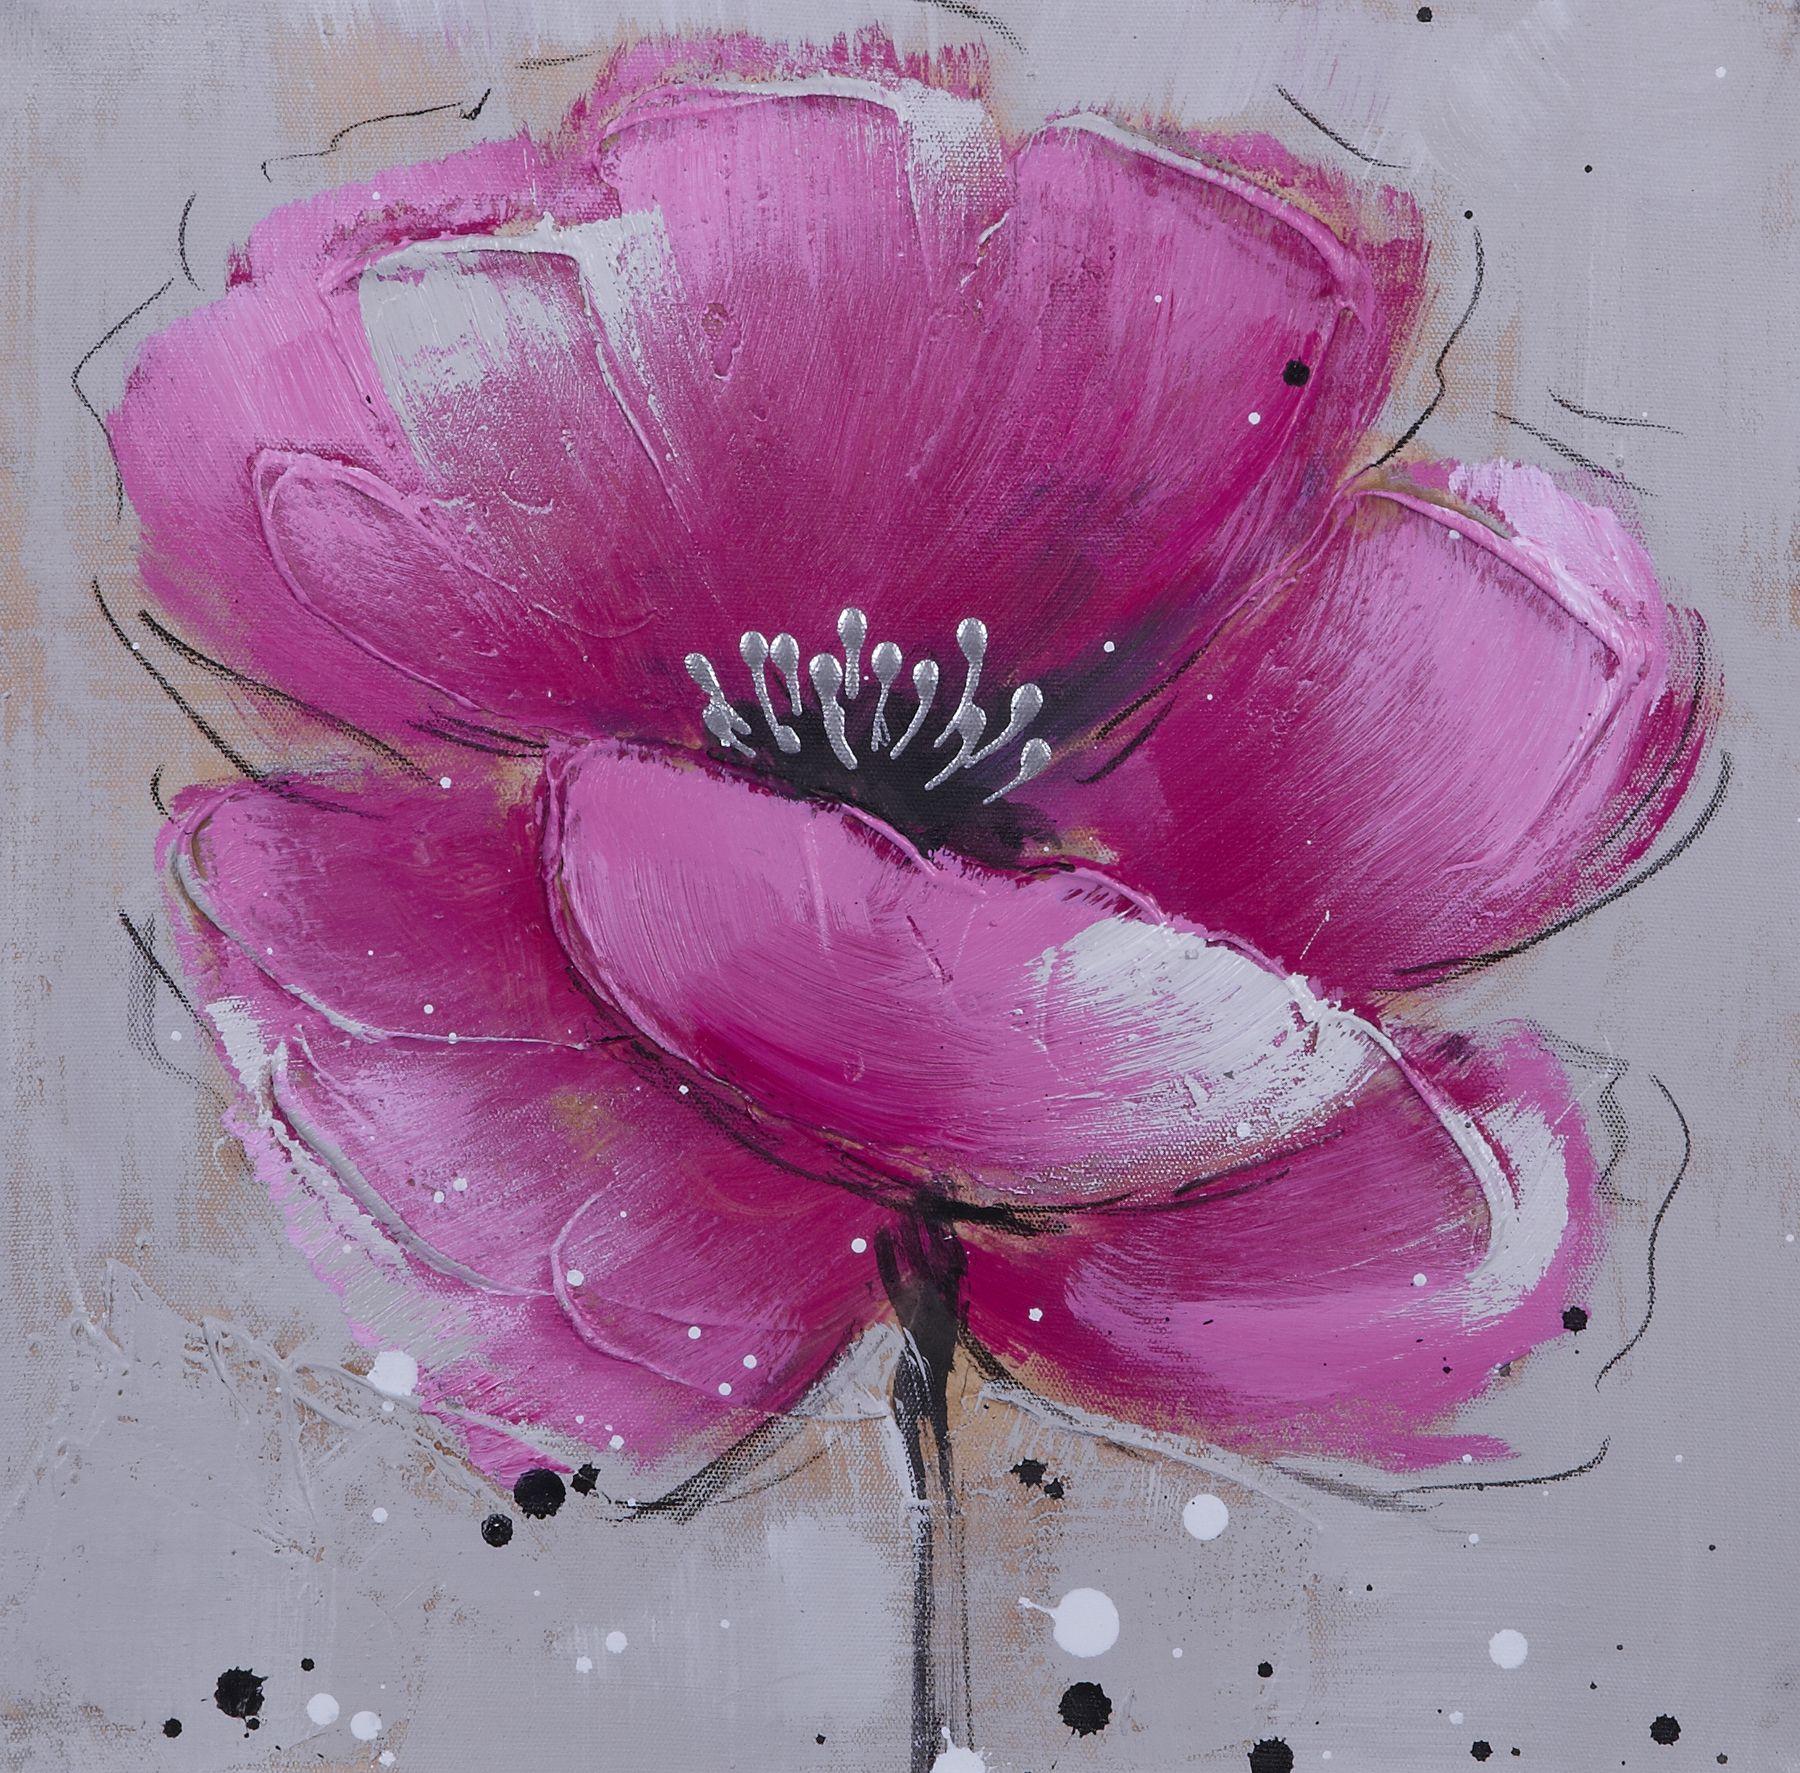 tableau peinture sur toile fleur velvet flowery 3 1 800 1 773 pixels. Black Bedroom Furniture Sets. Home Design Ideas